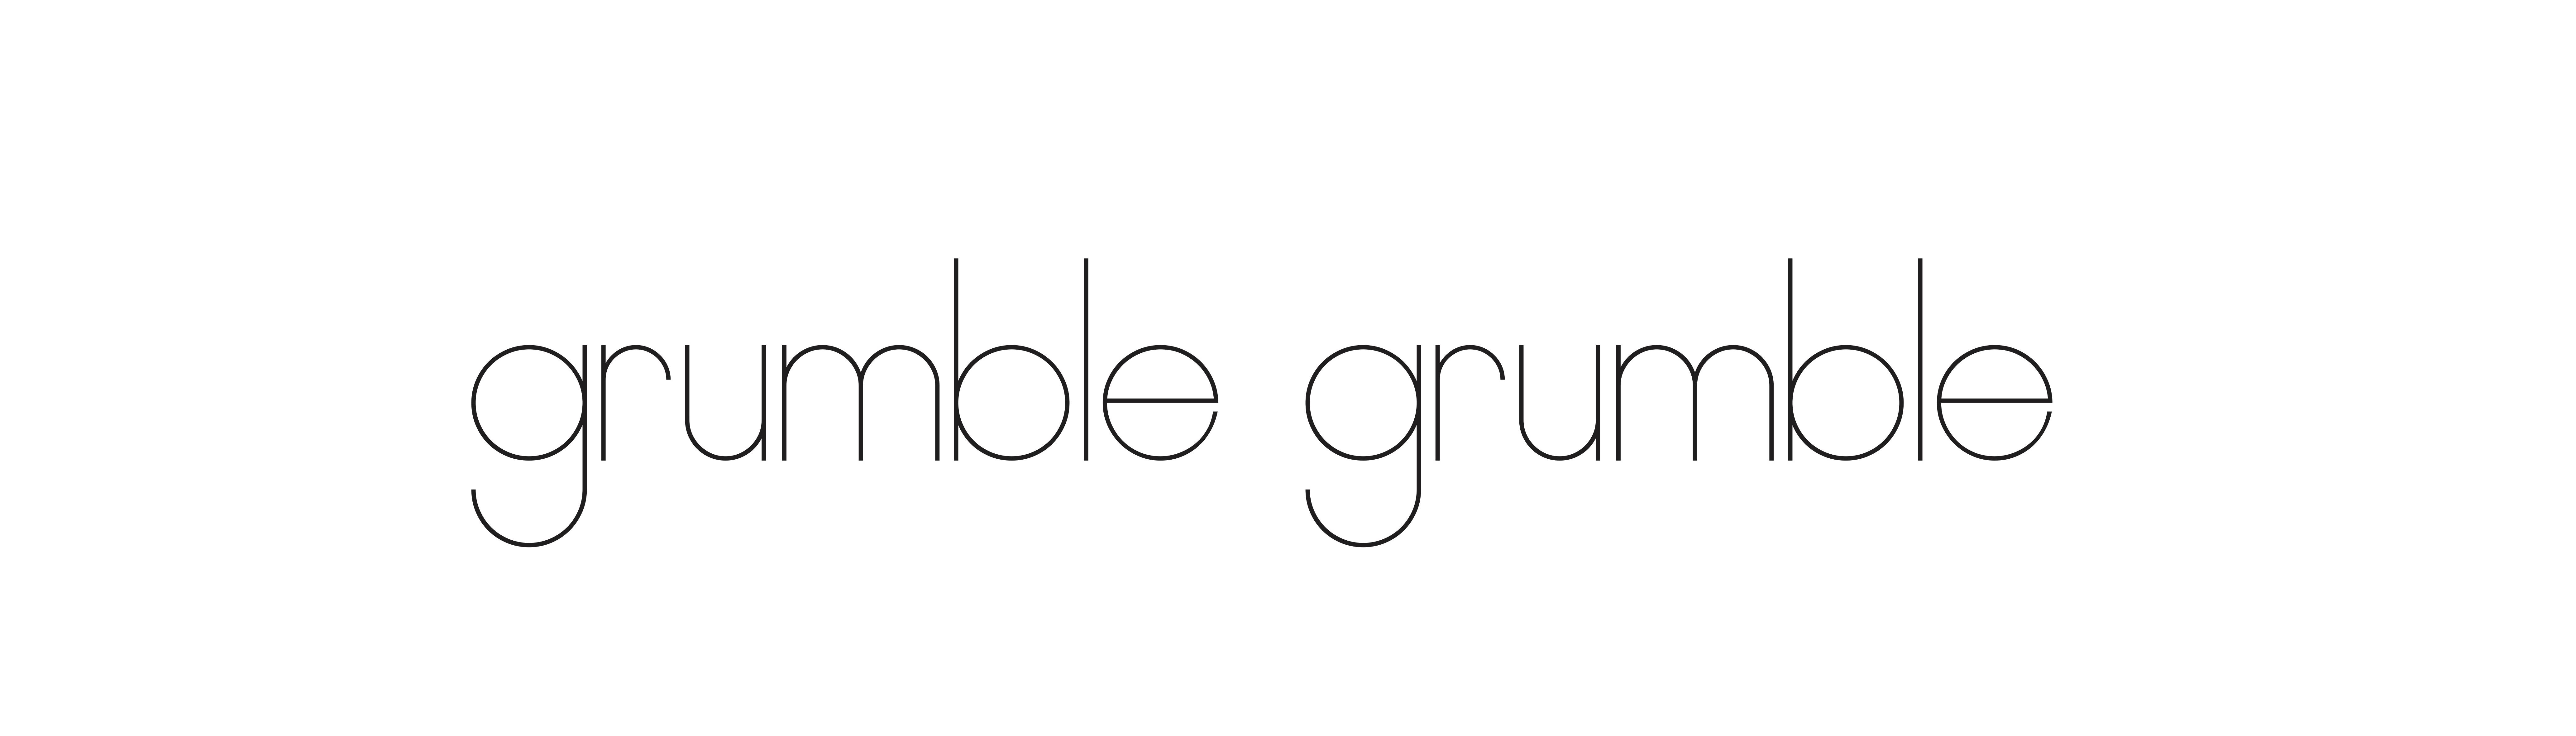 grumble grumble